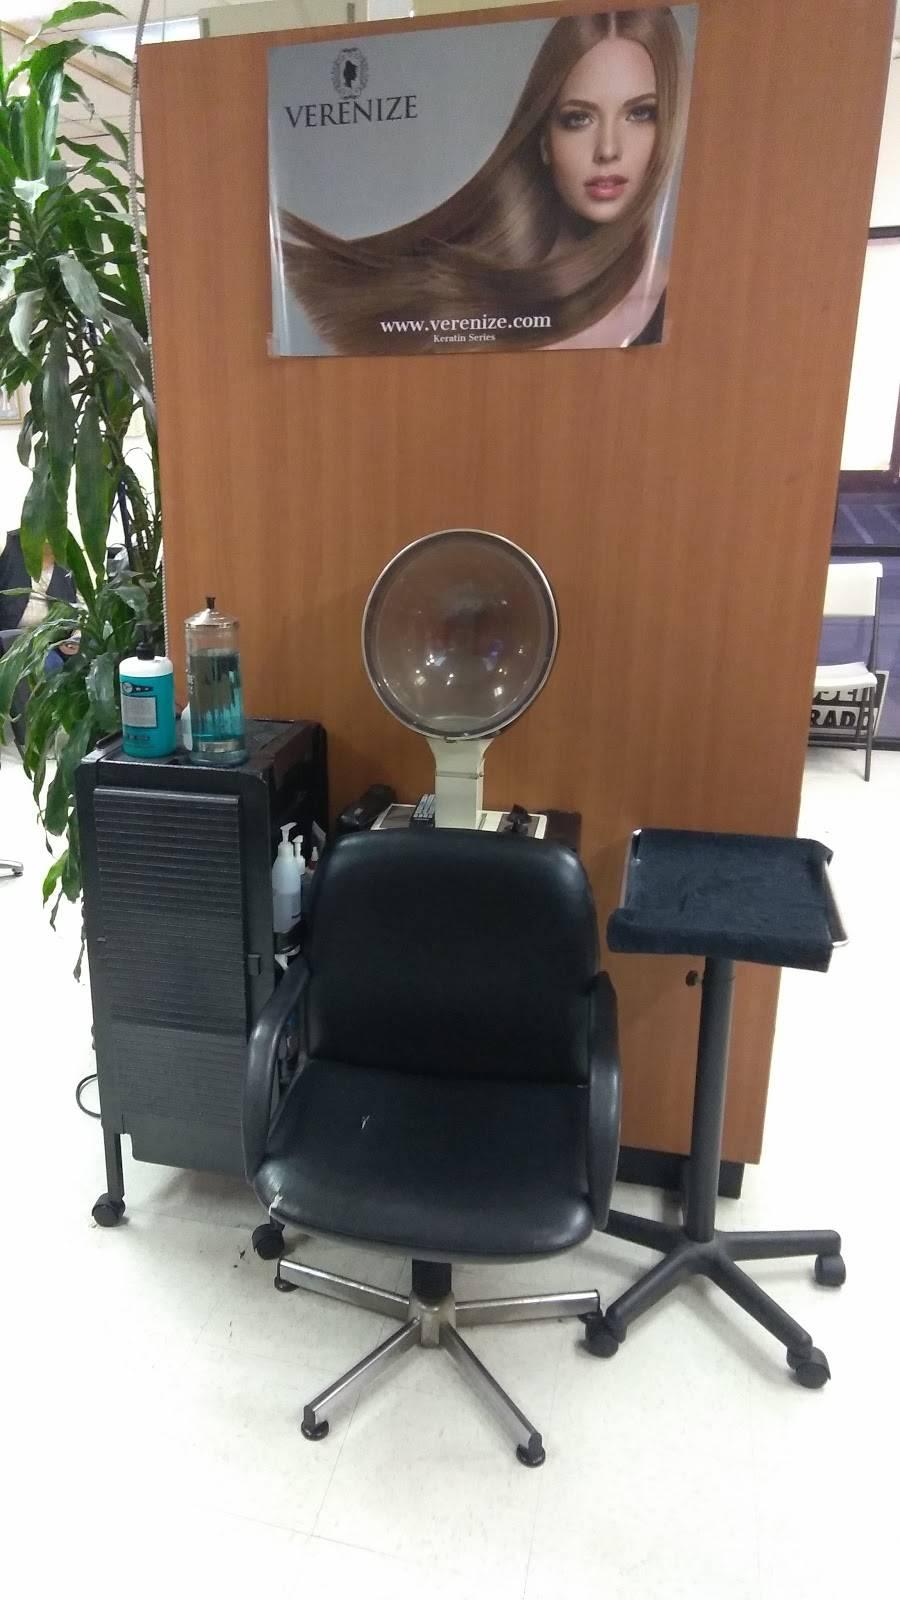 Nancys Hair Salon - hair care    Photo 3 of 7   Address: 887 W 19th St, Costa Mesa, CA 92627, USA   Phone: (949) 645-9044